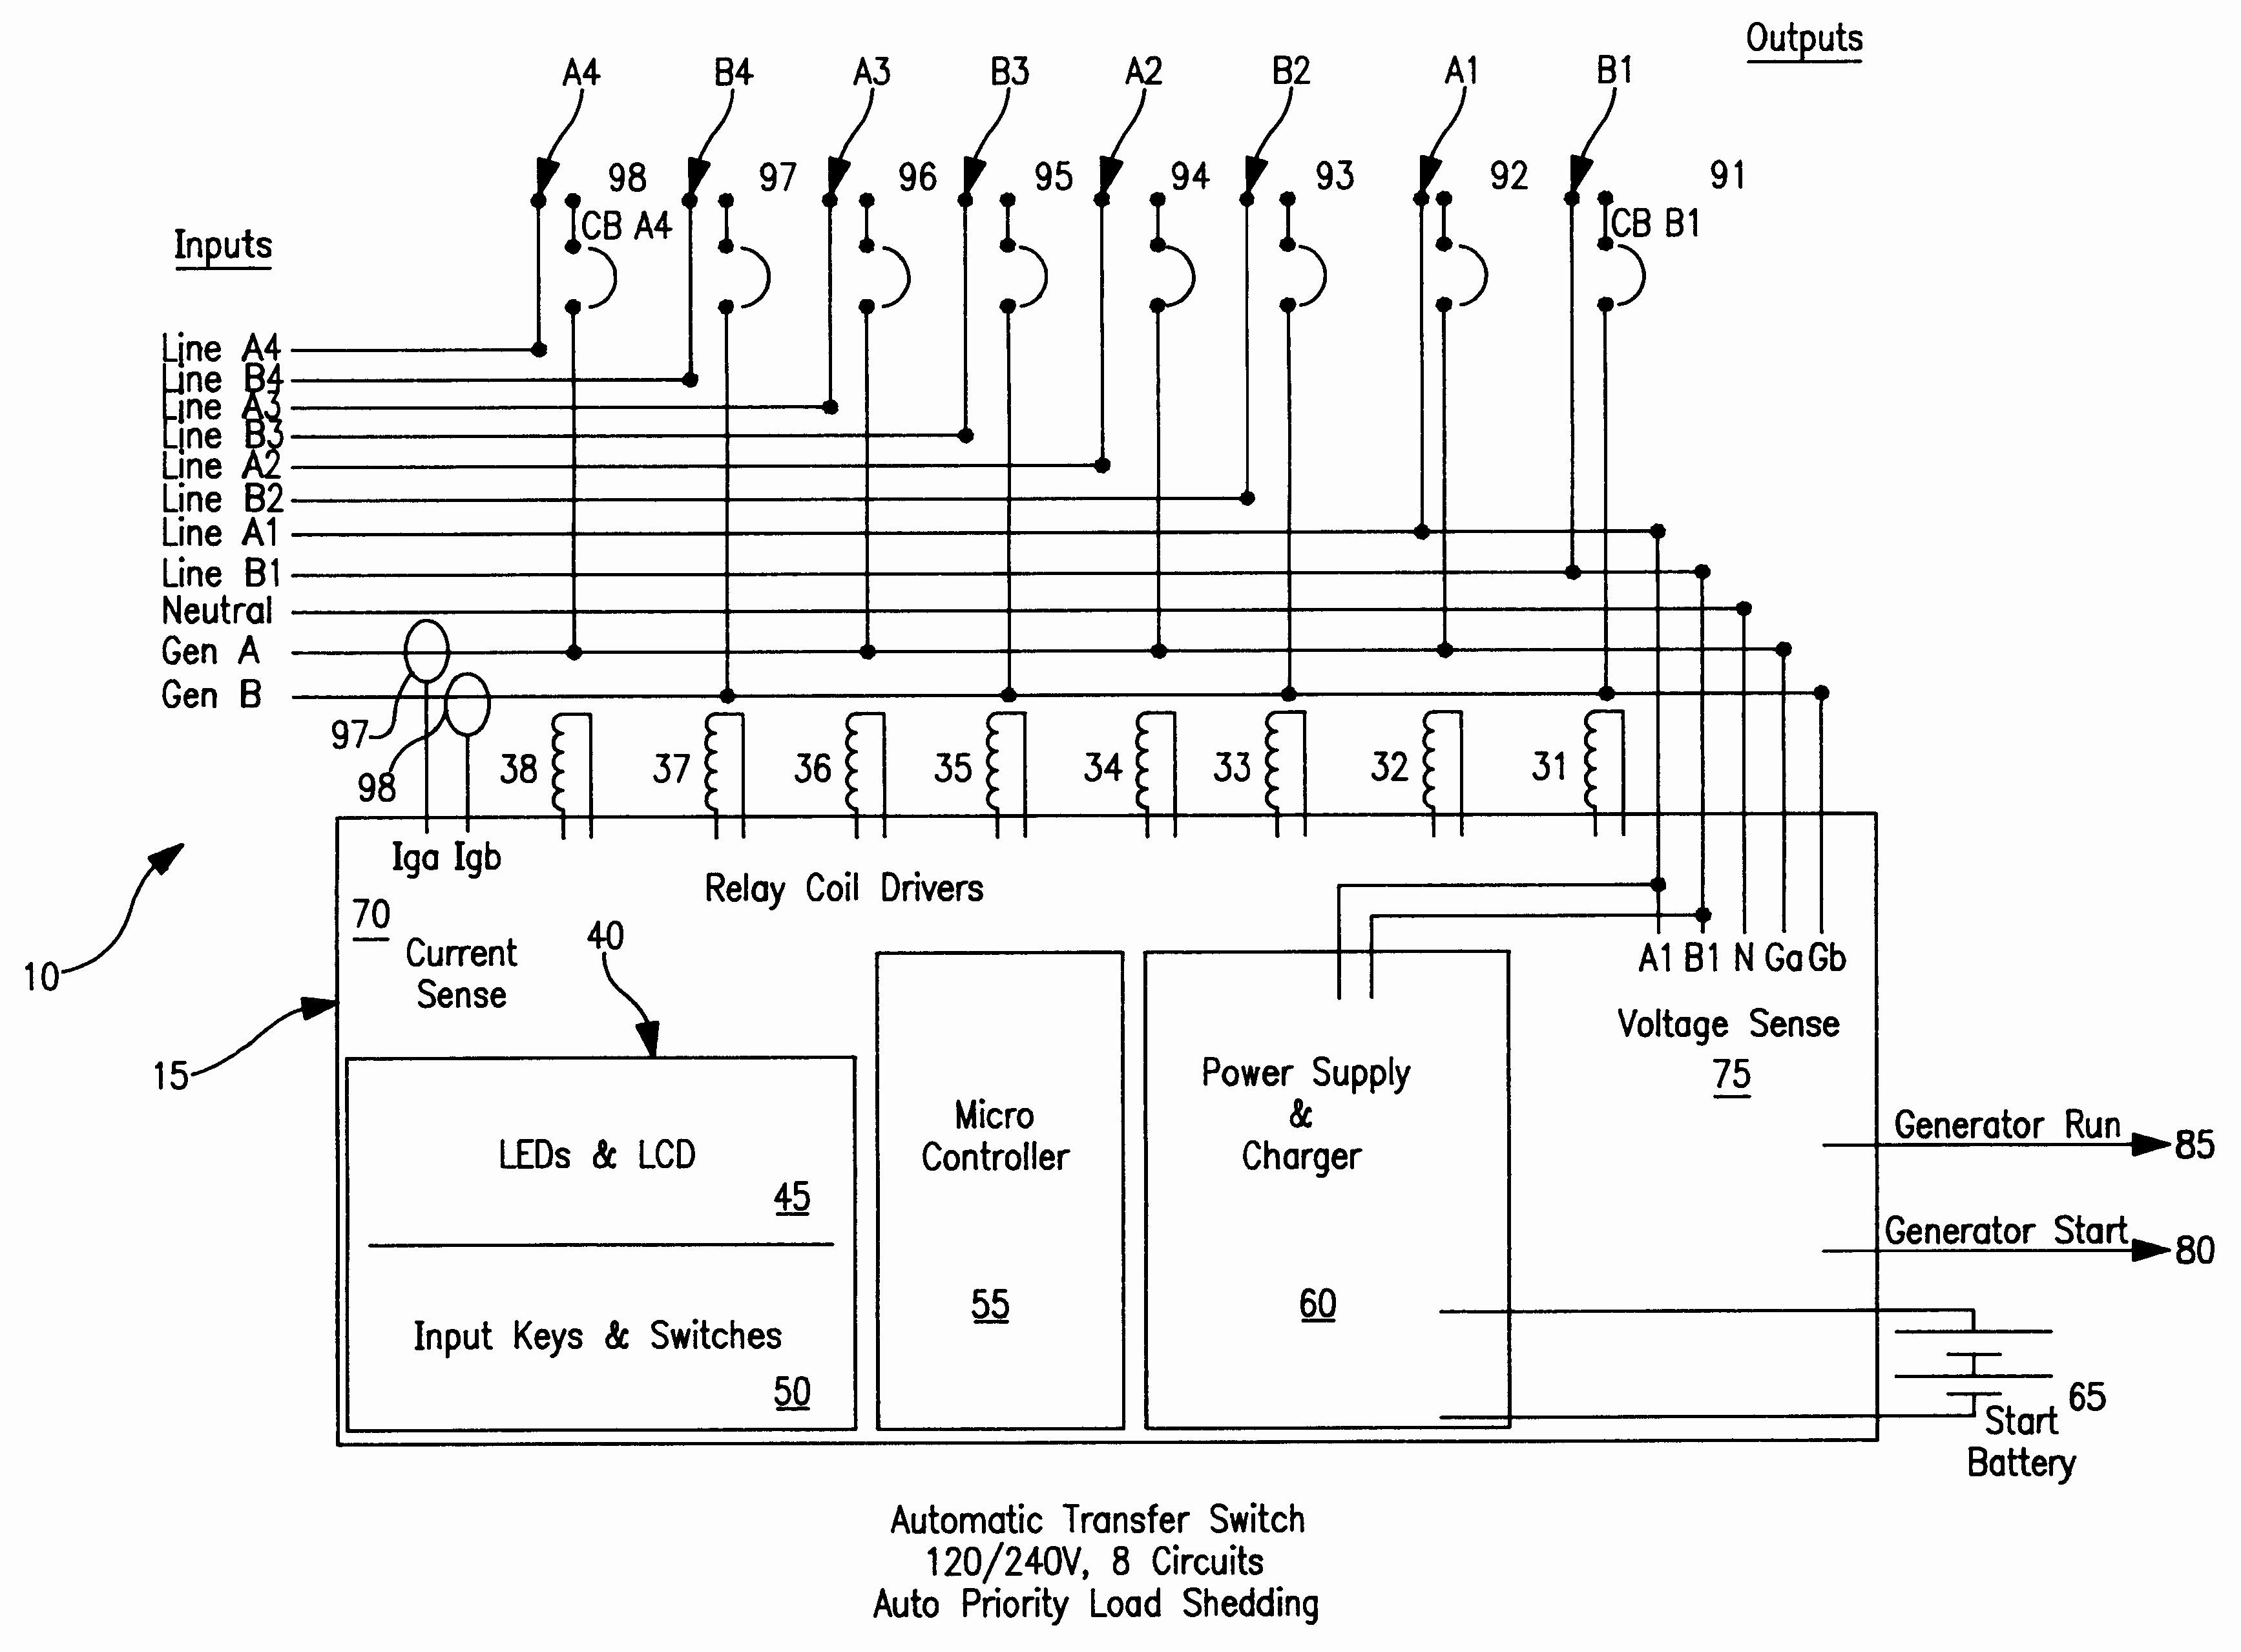 Generac Automatic Transfer Switch Schematic